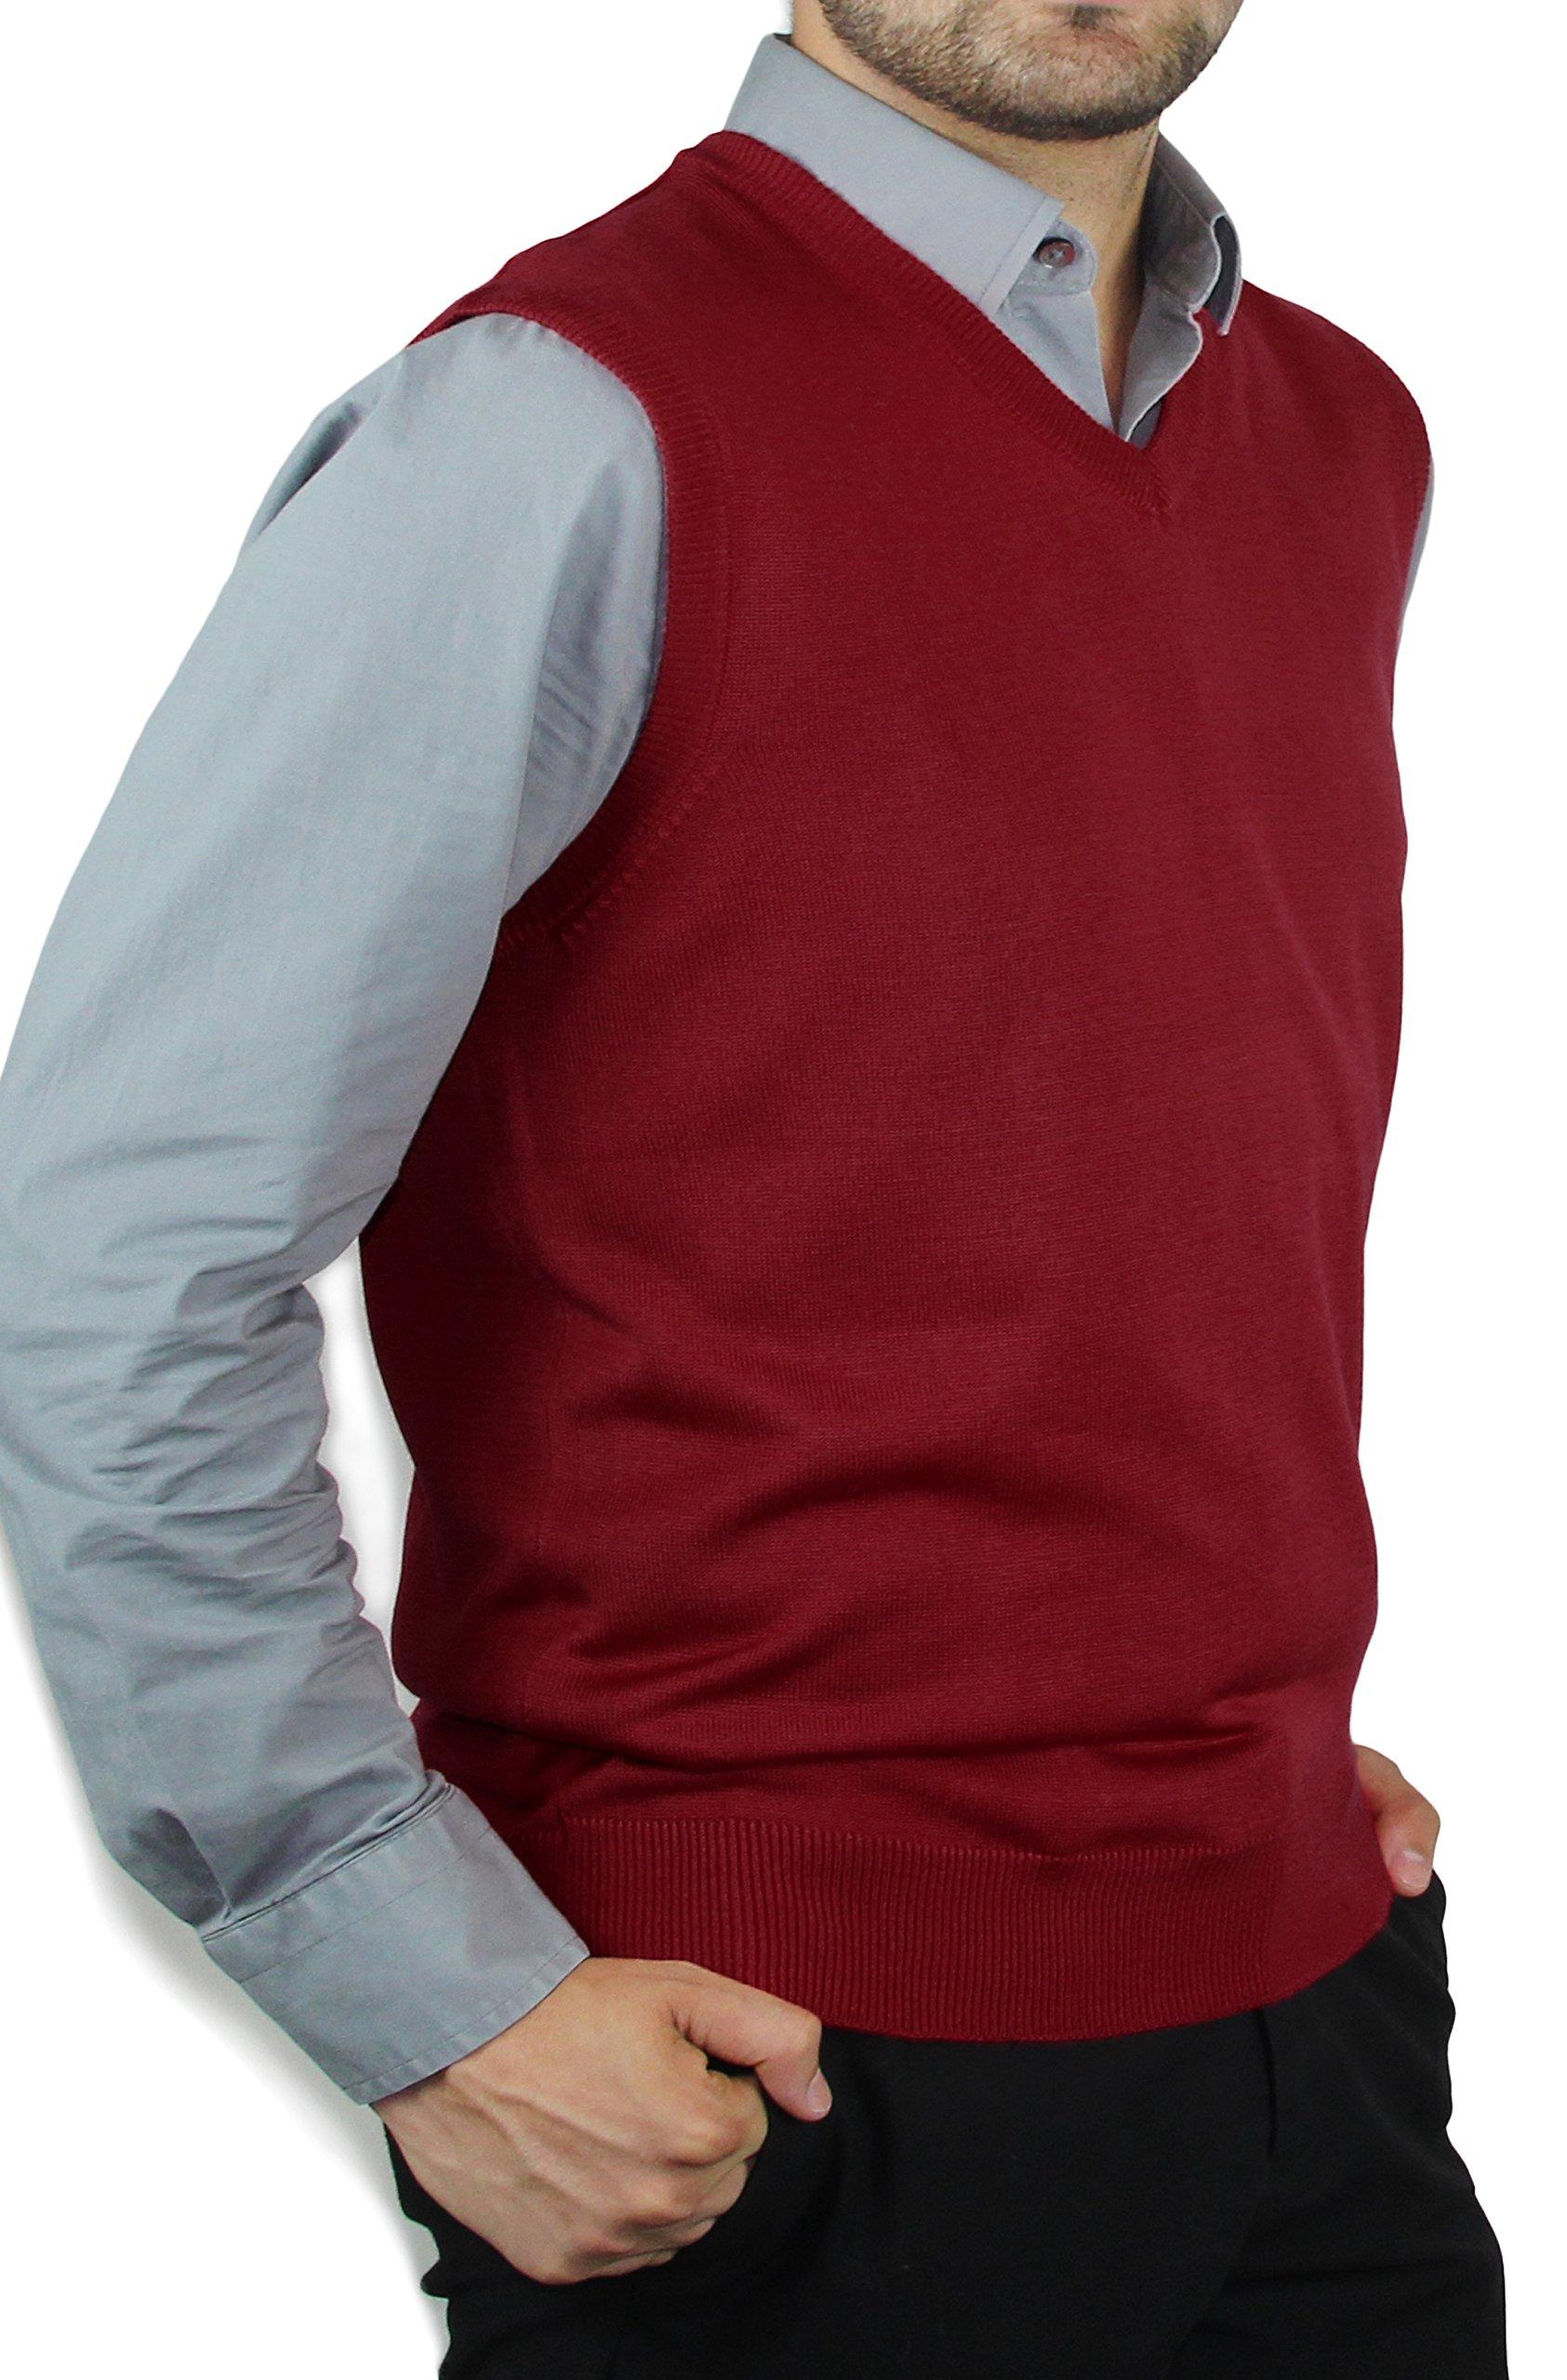 Blue Ocean Solid Color Sweater Vest-Medium Burgundy by Blue Ocean